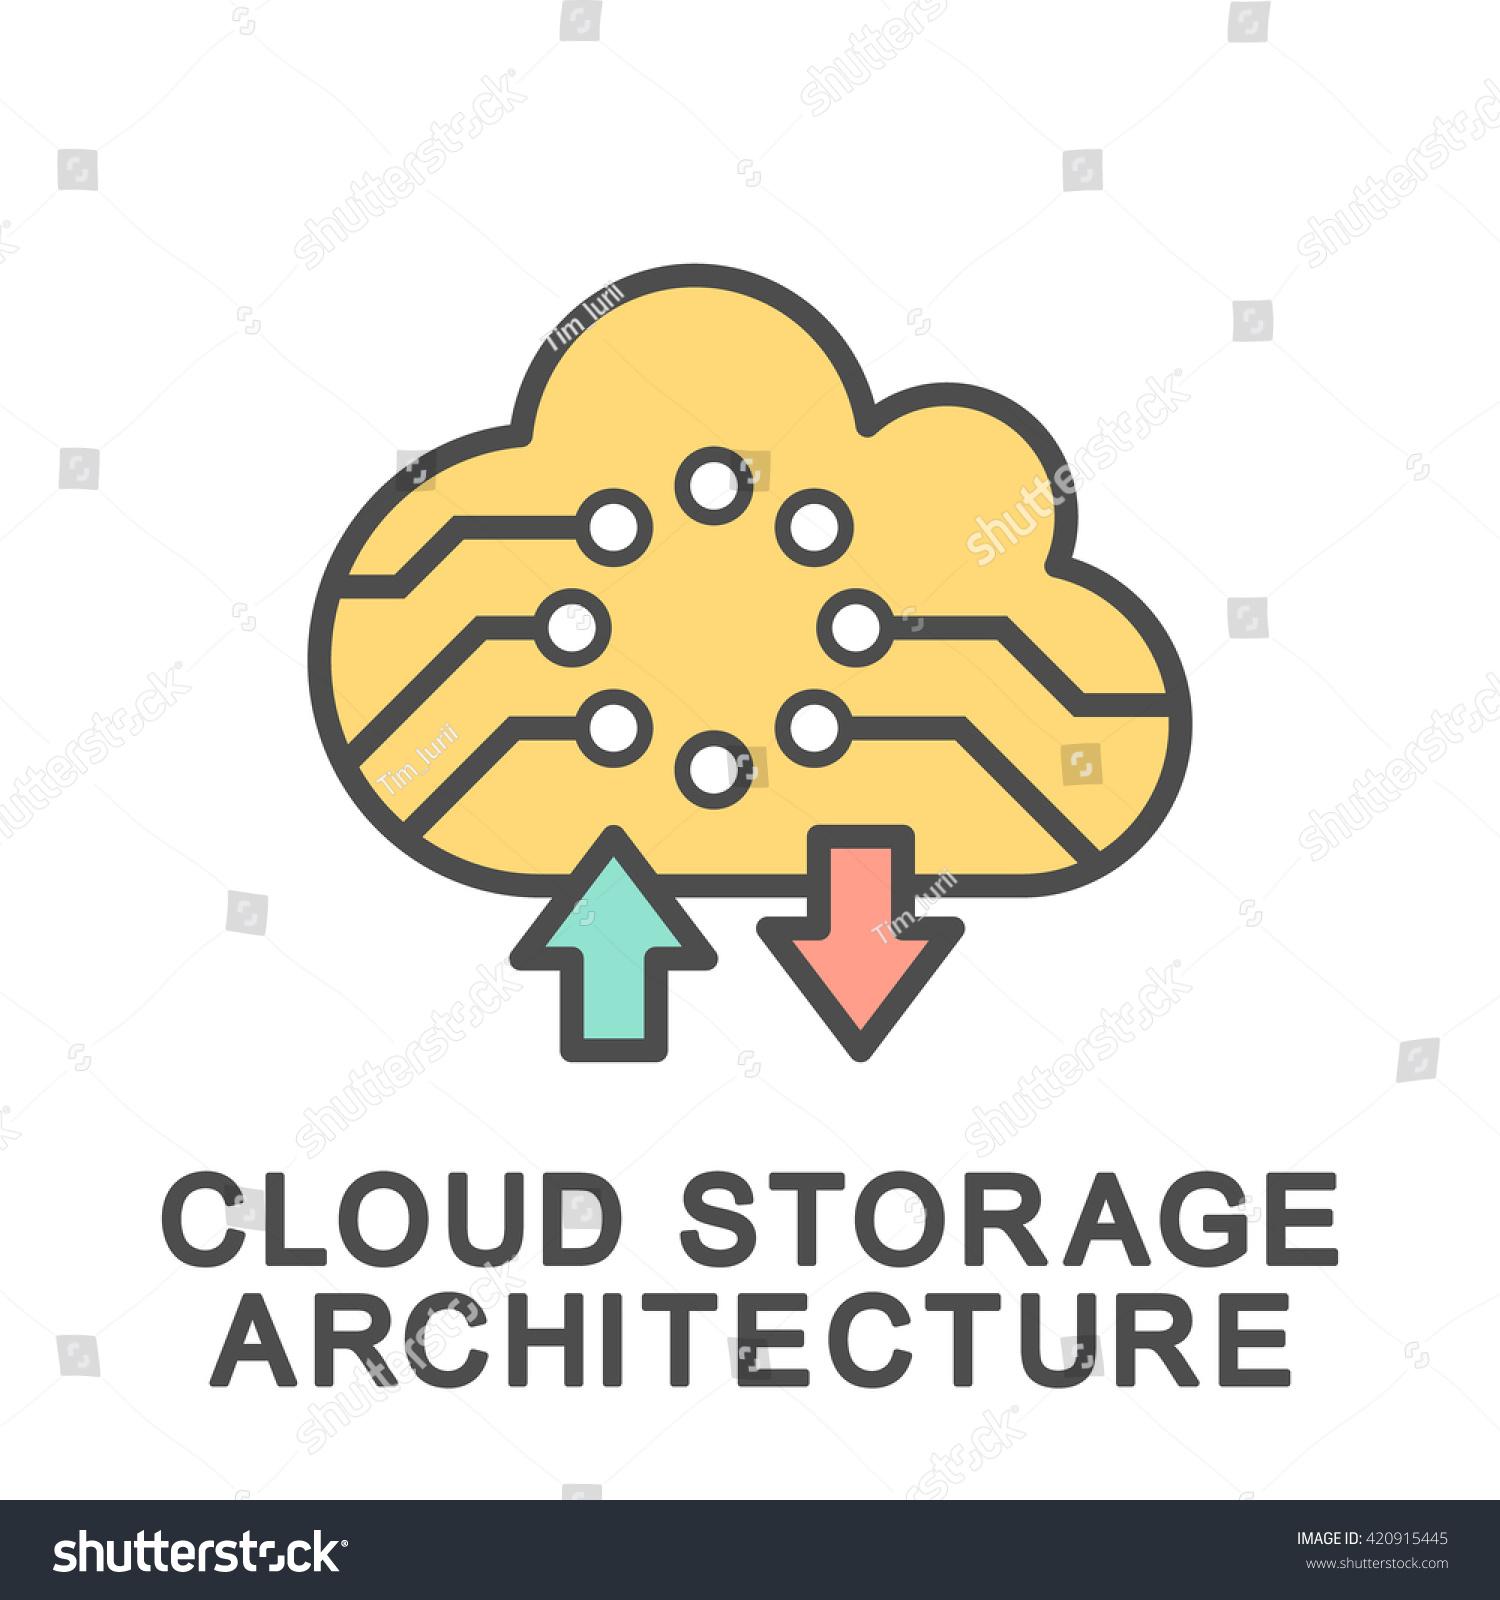 Cloud Storage Architecture Icon The Thin Contour Lines